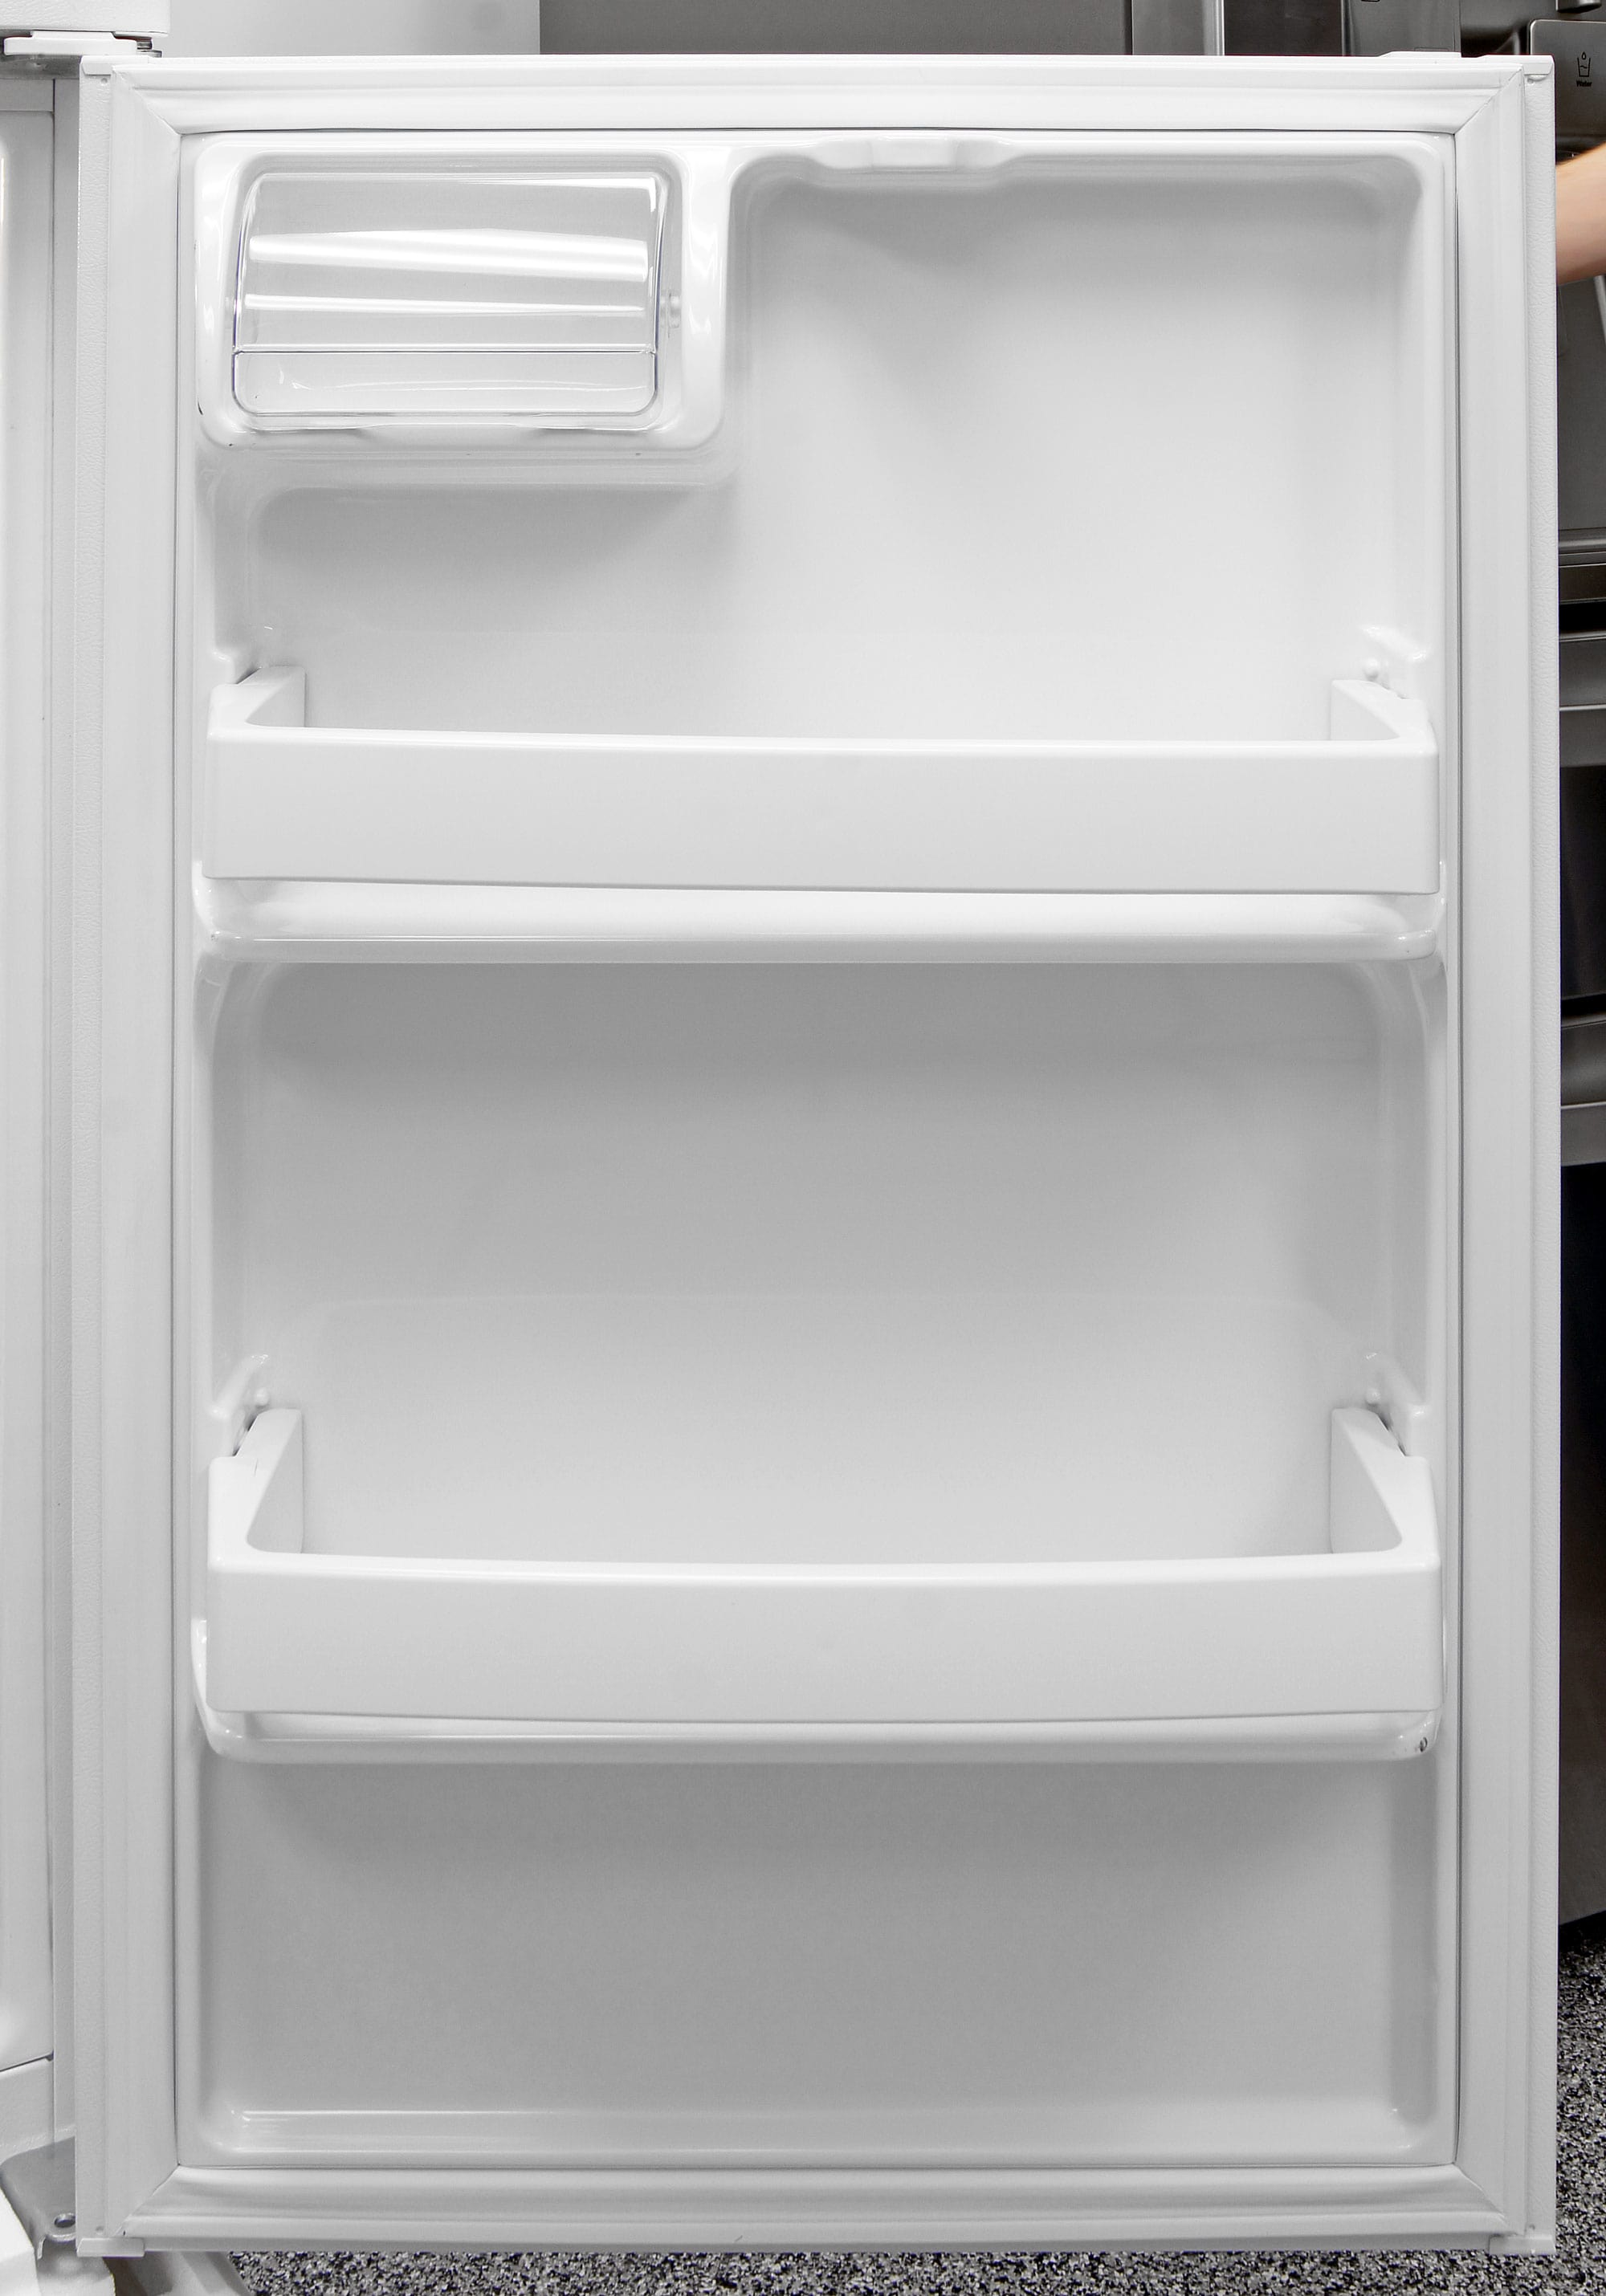 GE GTS16DTHWW Refrigerator Review - Reviewed.com Refrigerators